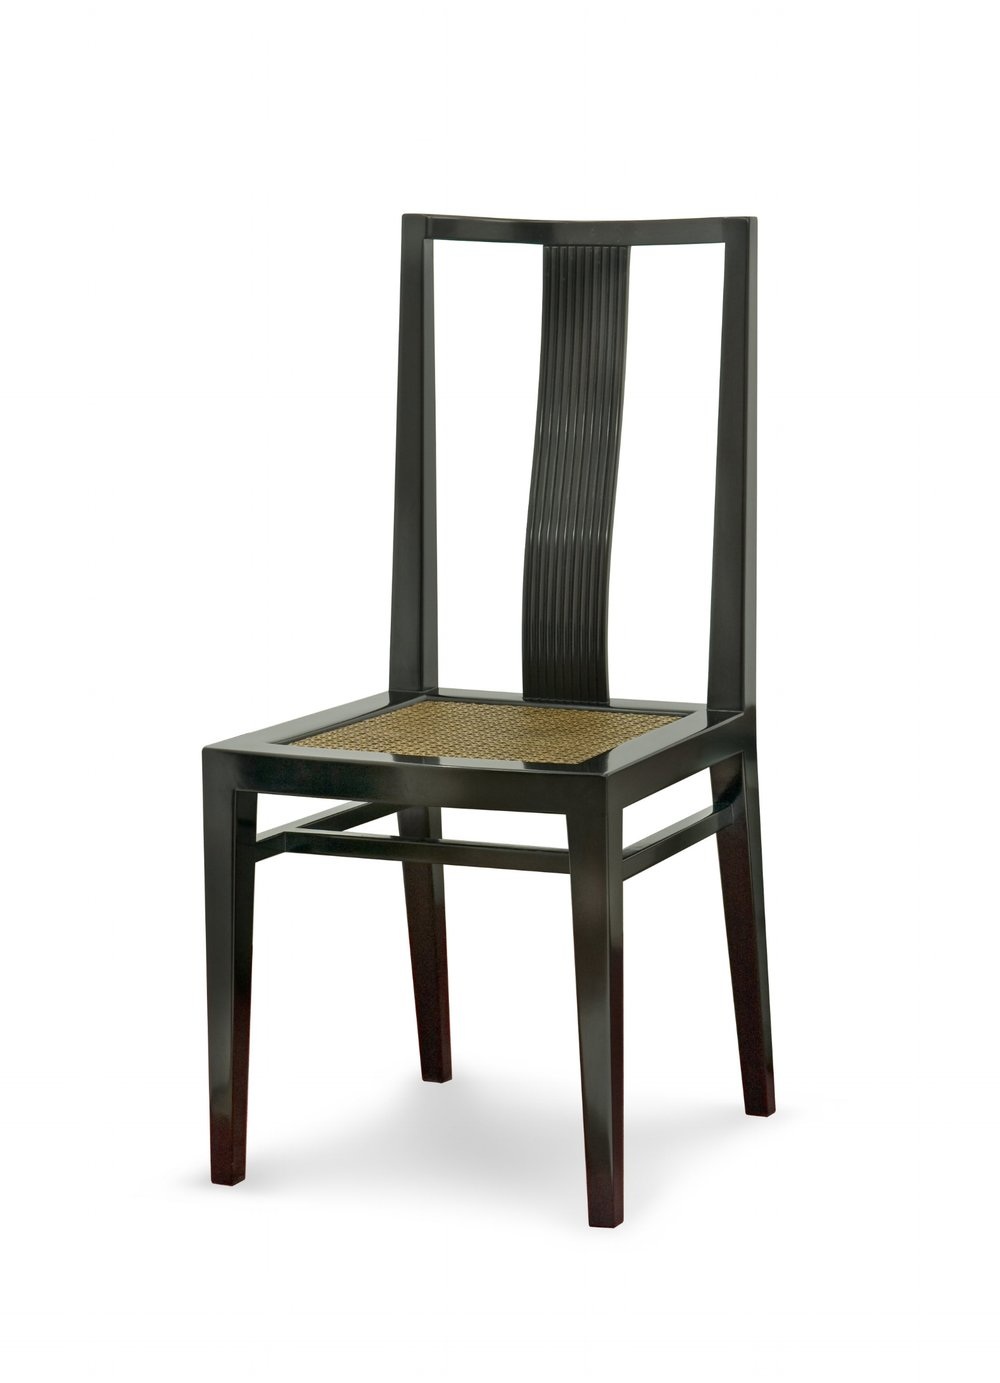 ....Art deco style furniture : Side chair..艺术装饰风格家具: 靠背椅....